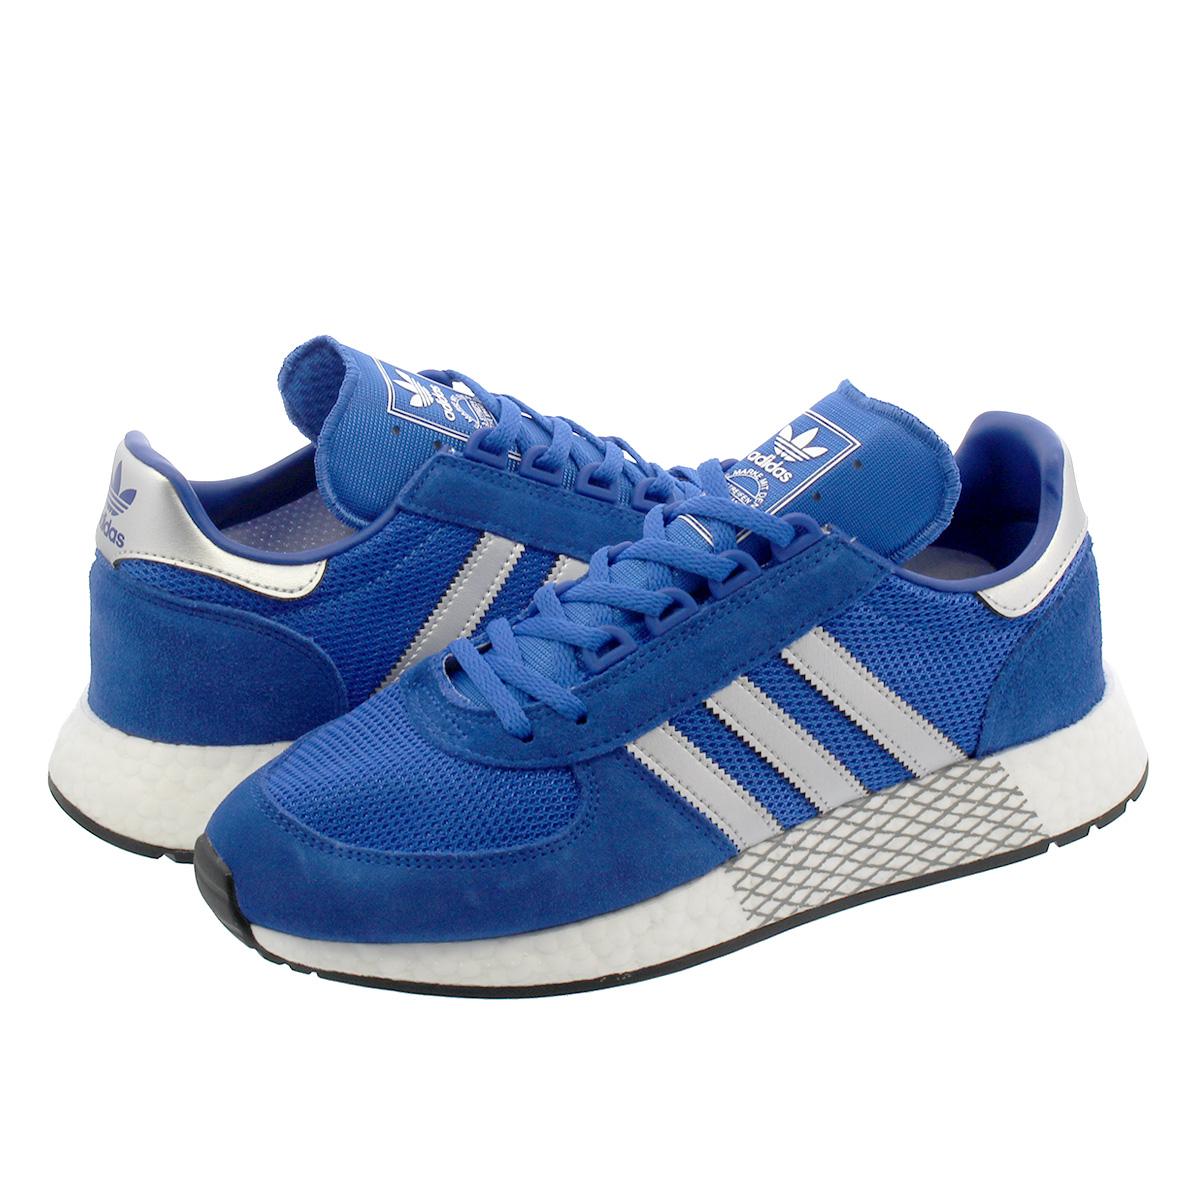 premium selection 7ccb4 6f016 SELECT SHOP LOWTEX  adidas MARATHON x 5923 Adidas marathon x 5923 BLUE SILVER  MET COLLEGE ROYAL g26782   Rakuten Global Market